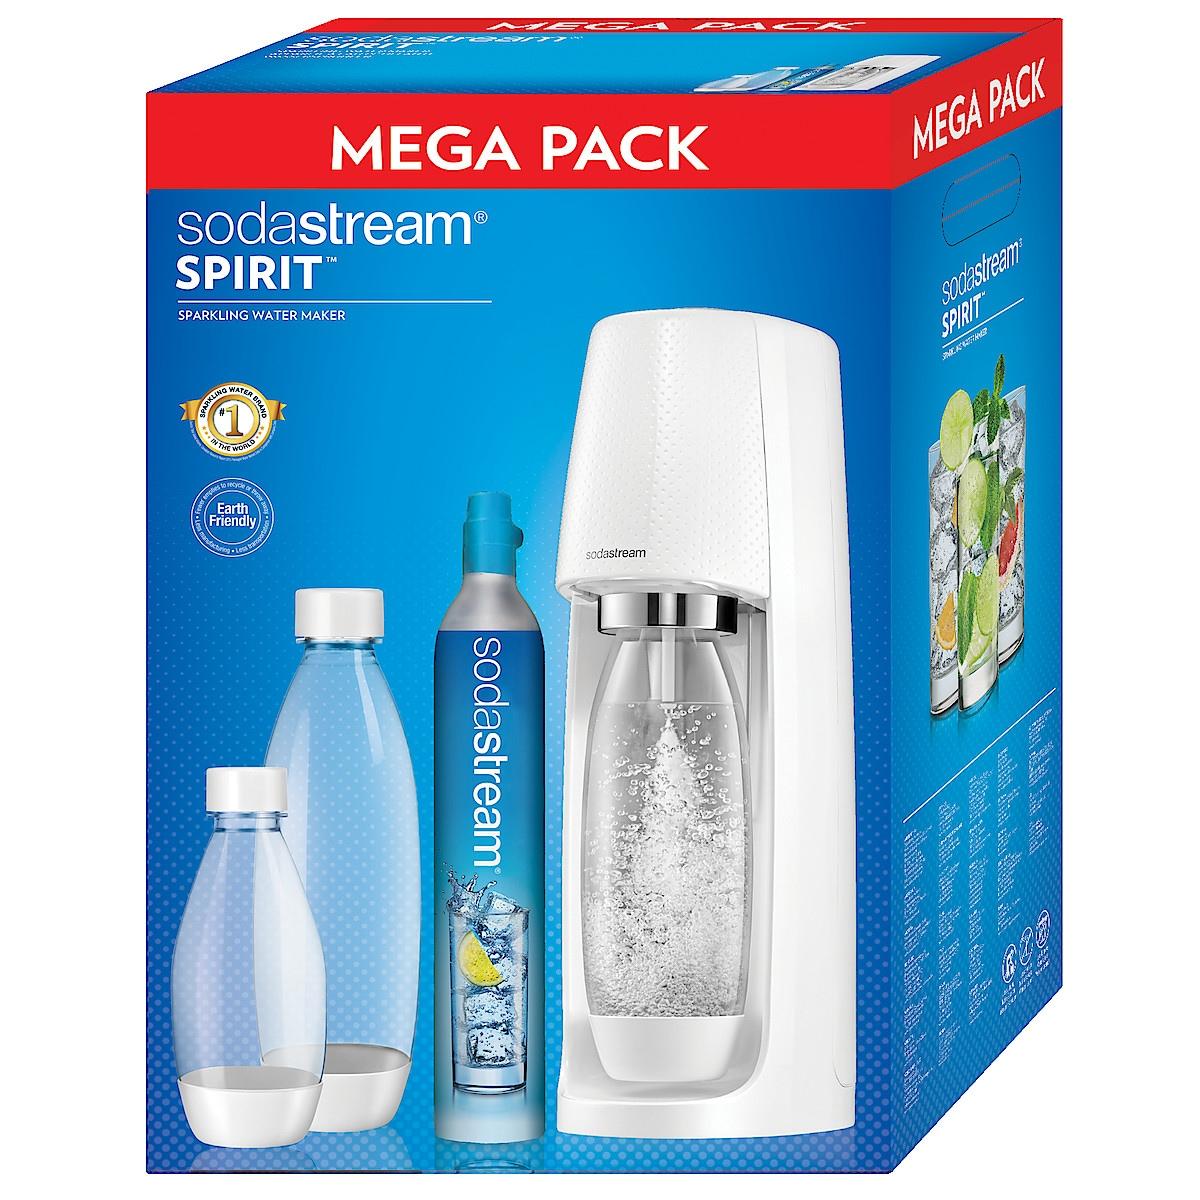 Sodastream Spirit MegaPack, kullsyremaskin